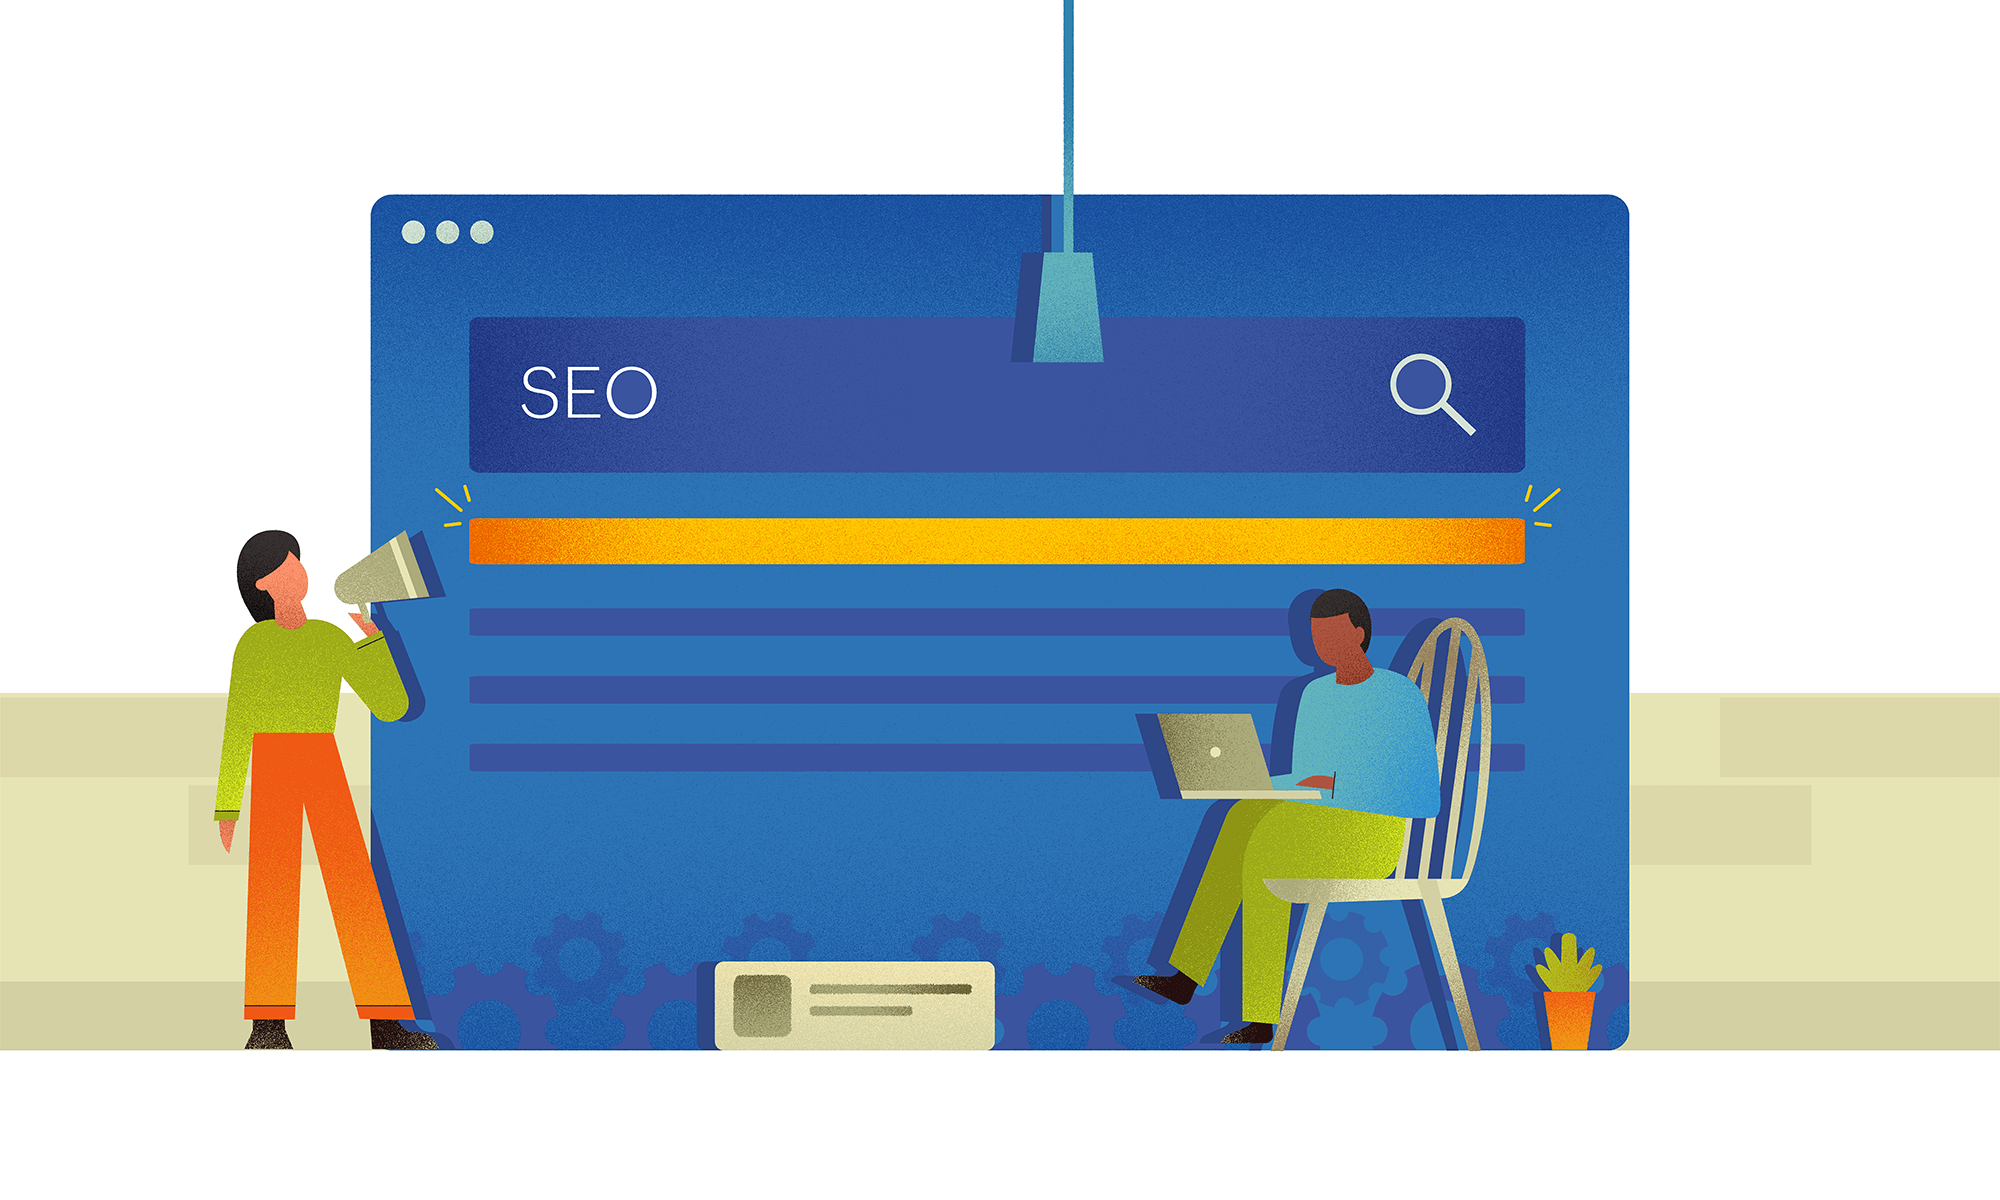 Optimising SEO for a website.